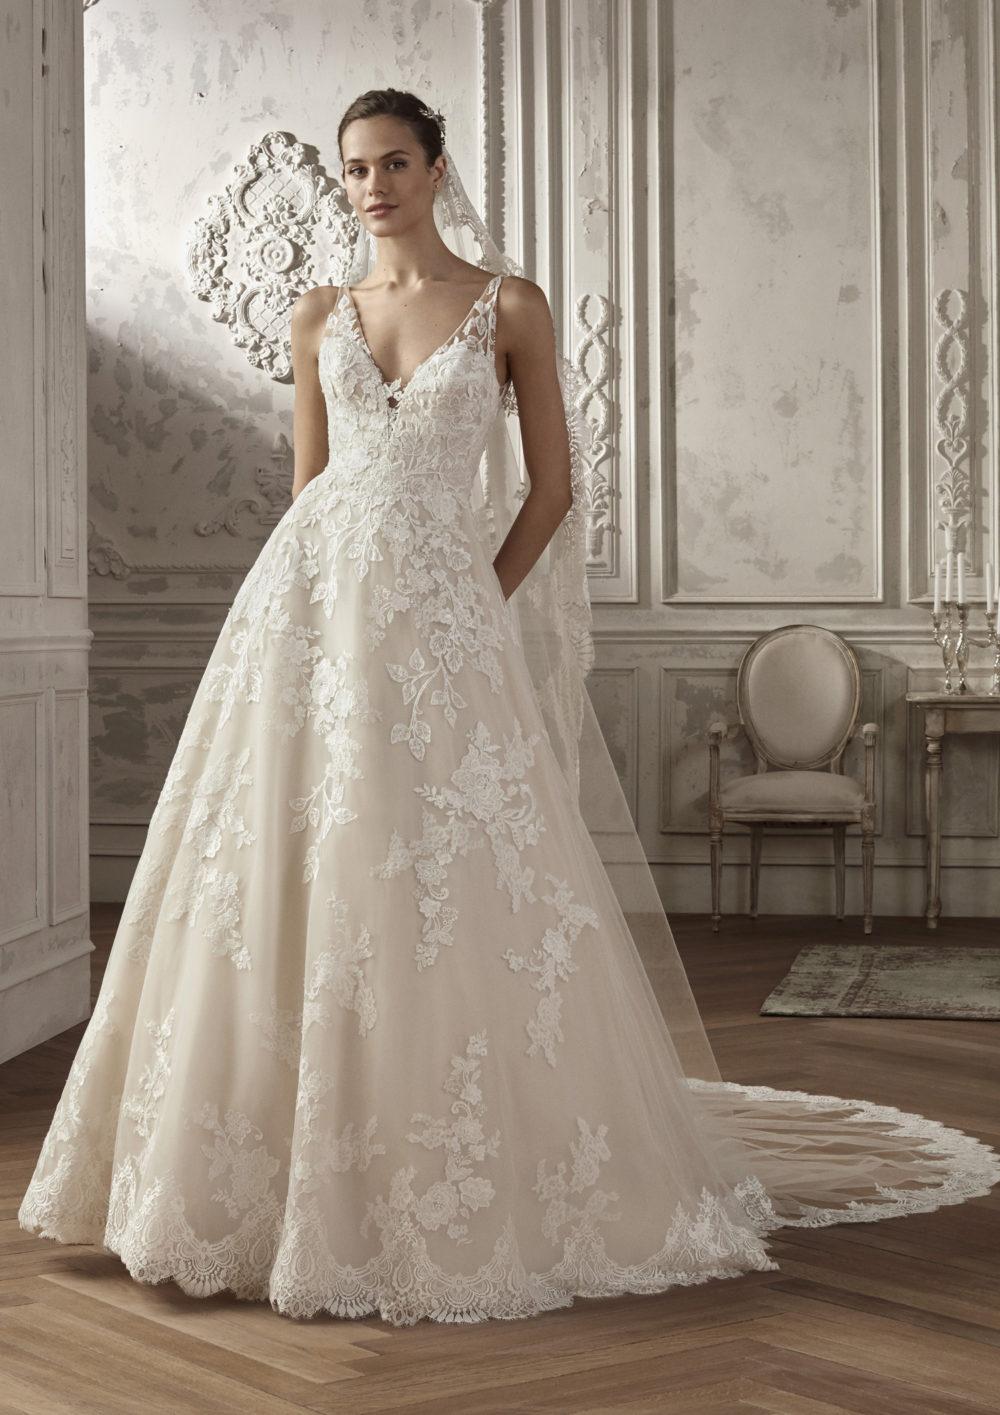 Mariages: abito da sposa San Patrick 2020 a Vicenza, Verona, Padova, Veneto AMPURIAS